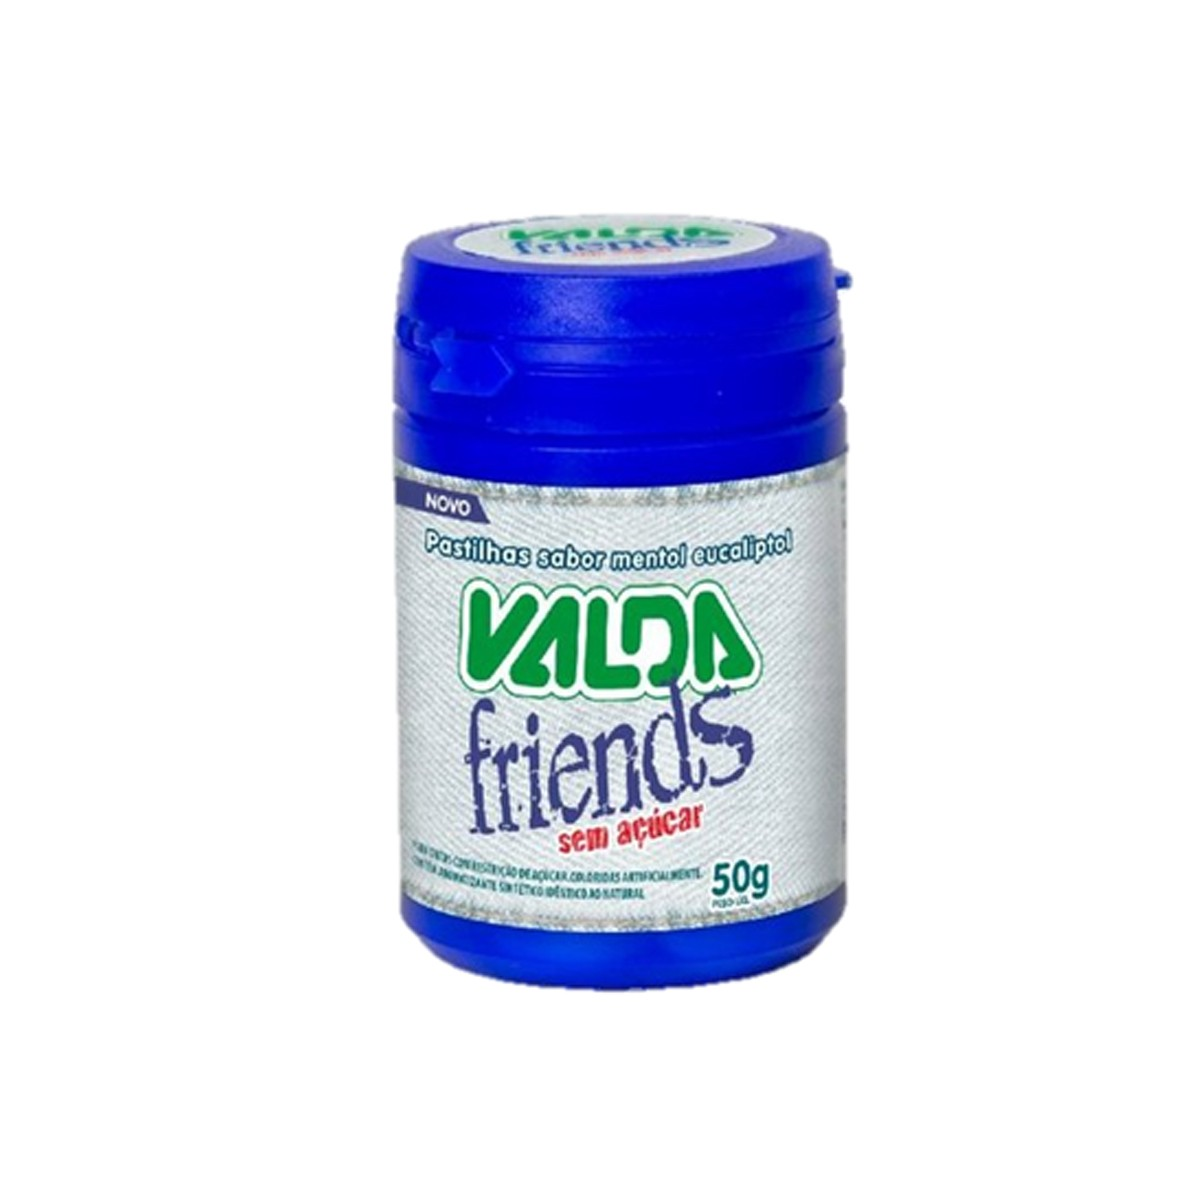 Pastilhas sabor Mentol Zero Friends de 50g - Valda